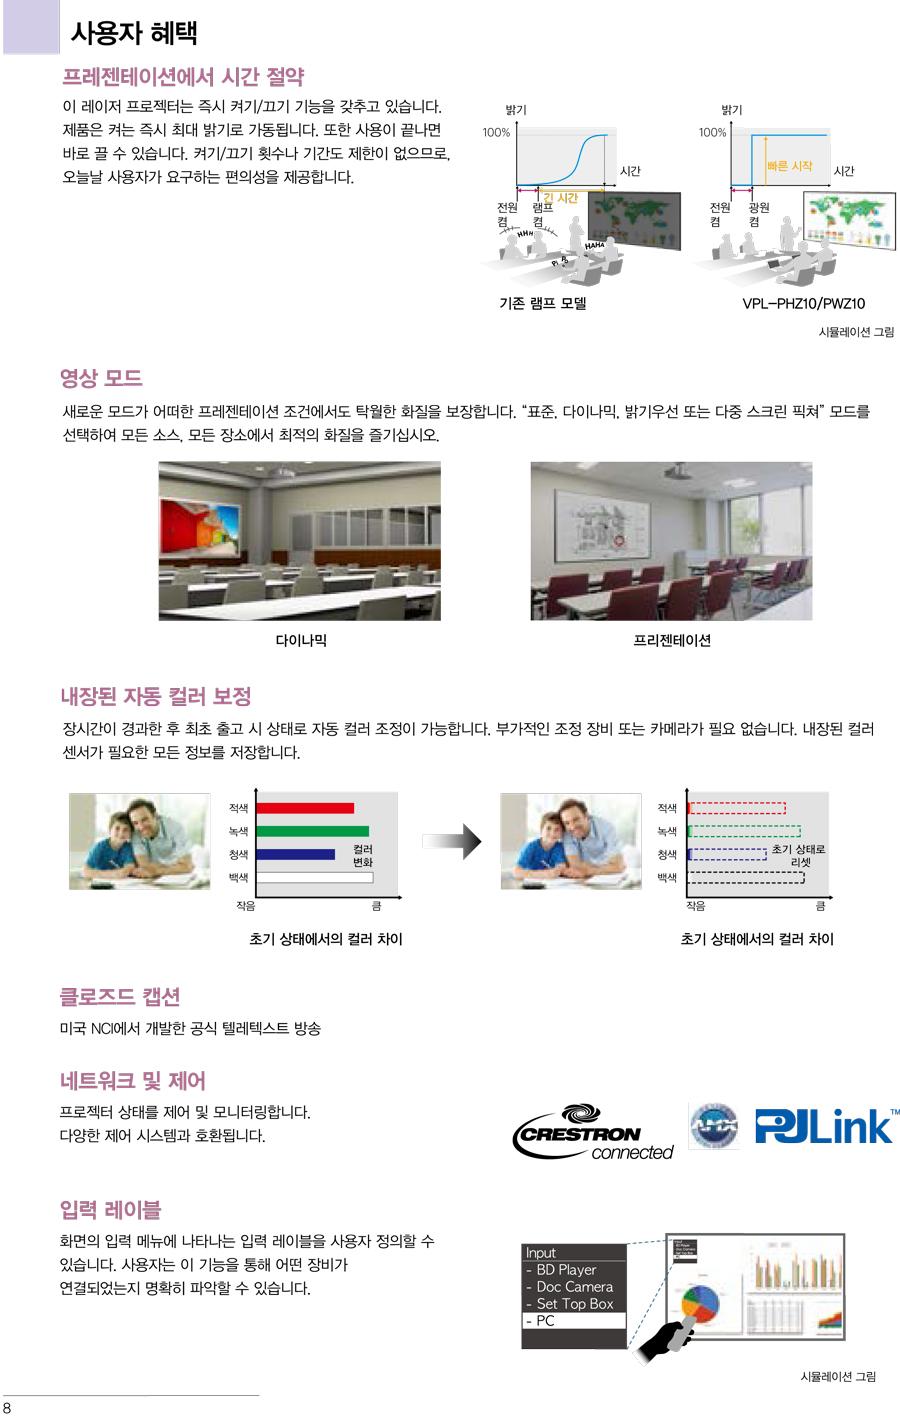 VPL-PHZ10_8.jpg